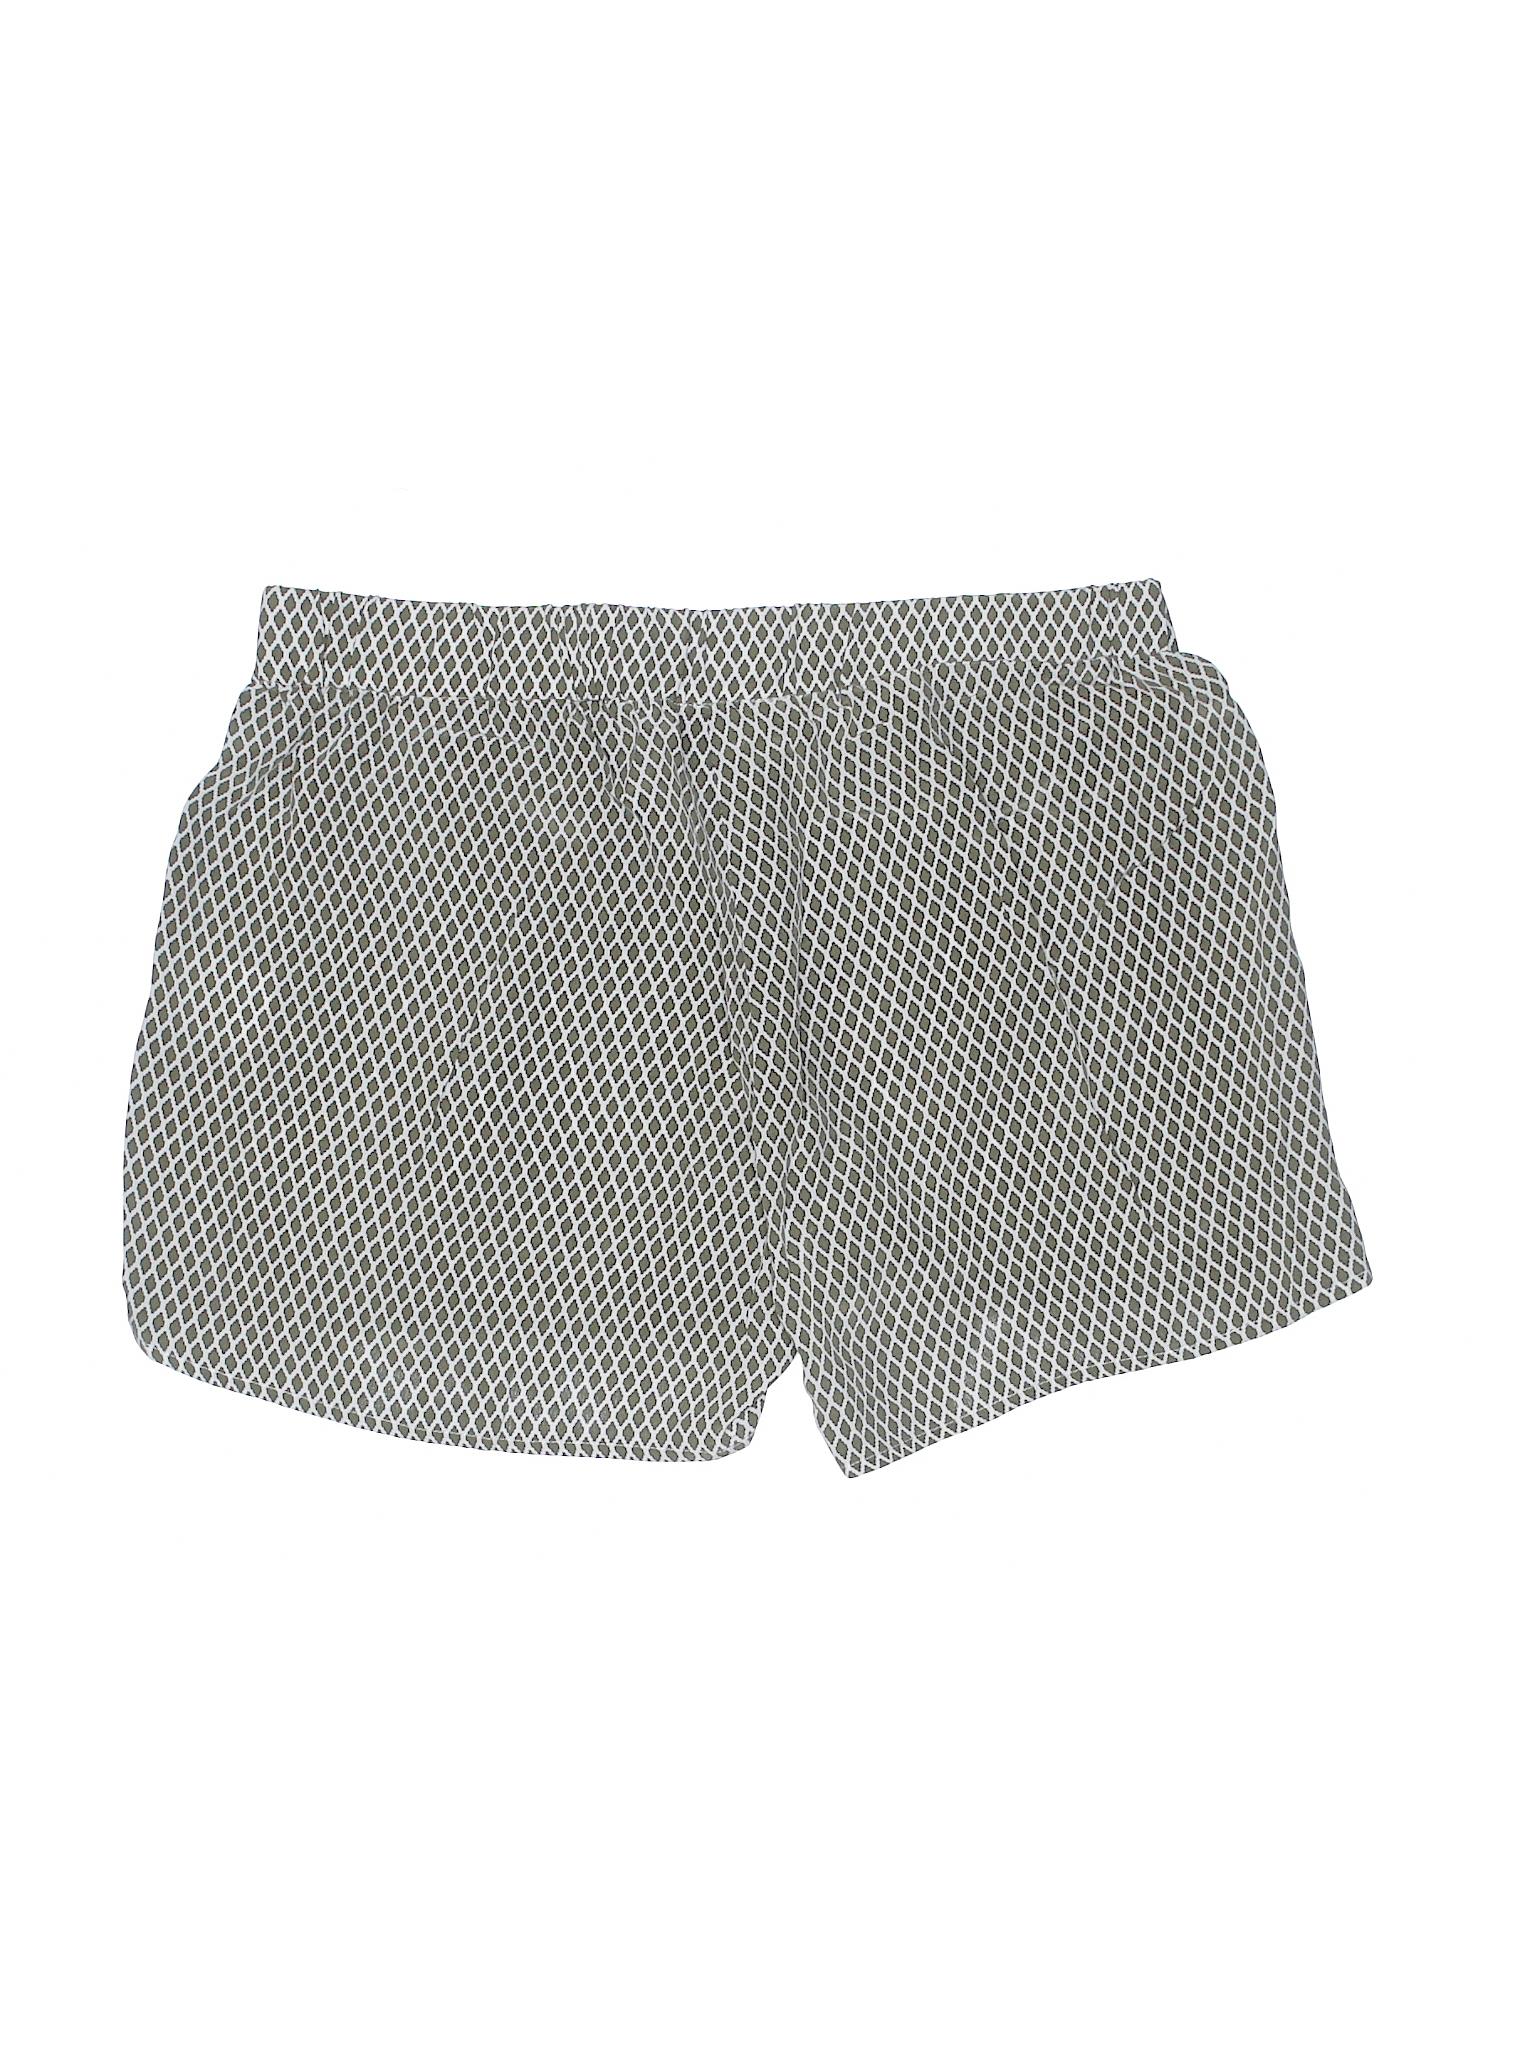 Shorts Equipment Shorts Shorts Boutique Equipment Boutique Boutique Equipment Boutique Boutique Shorts Equipment 744qUIan